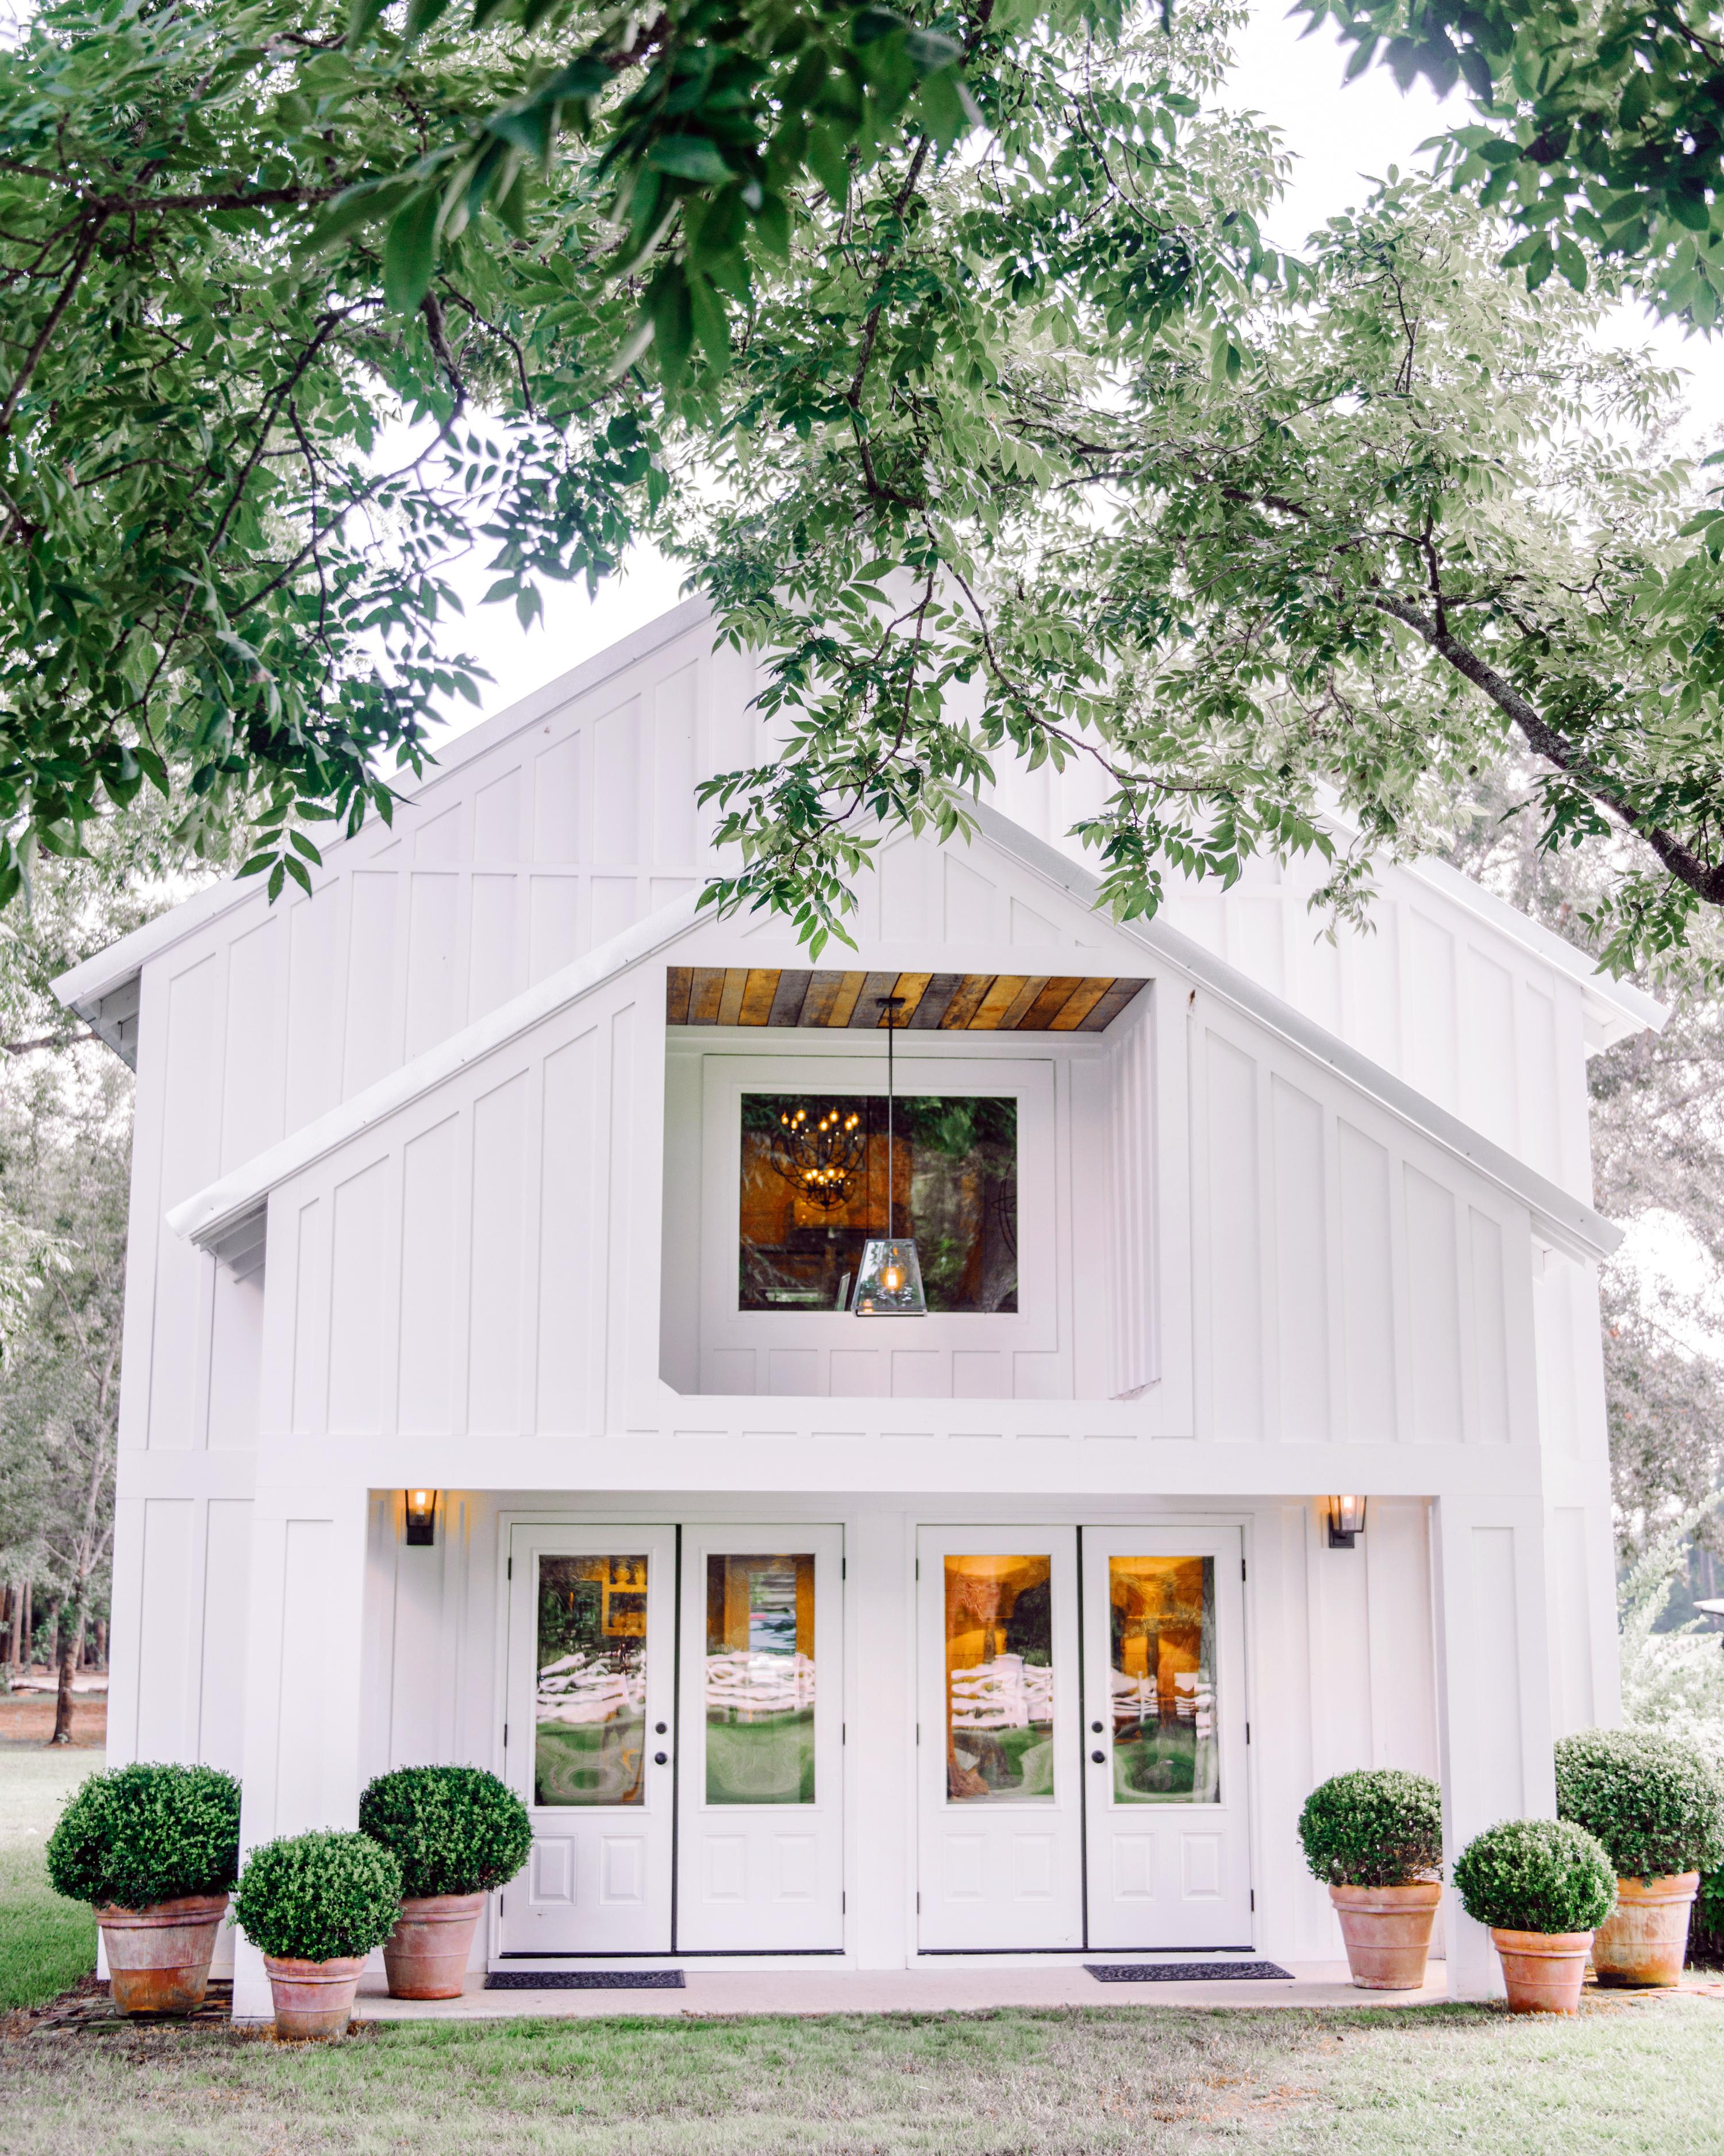 Plan a Charming Wedding at South Carolina's Wildberry Farm